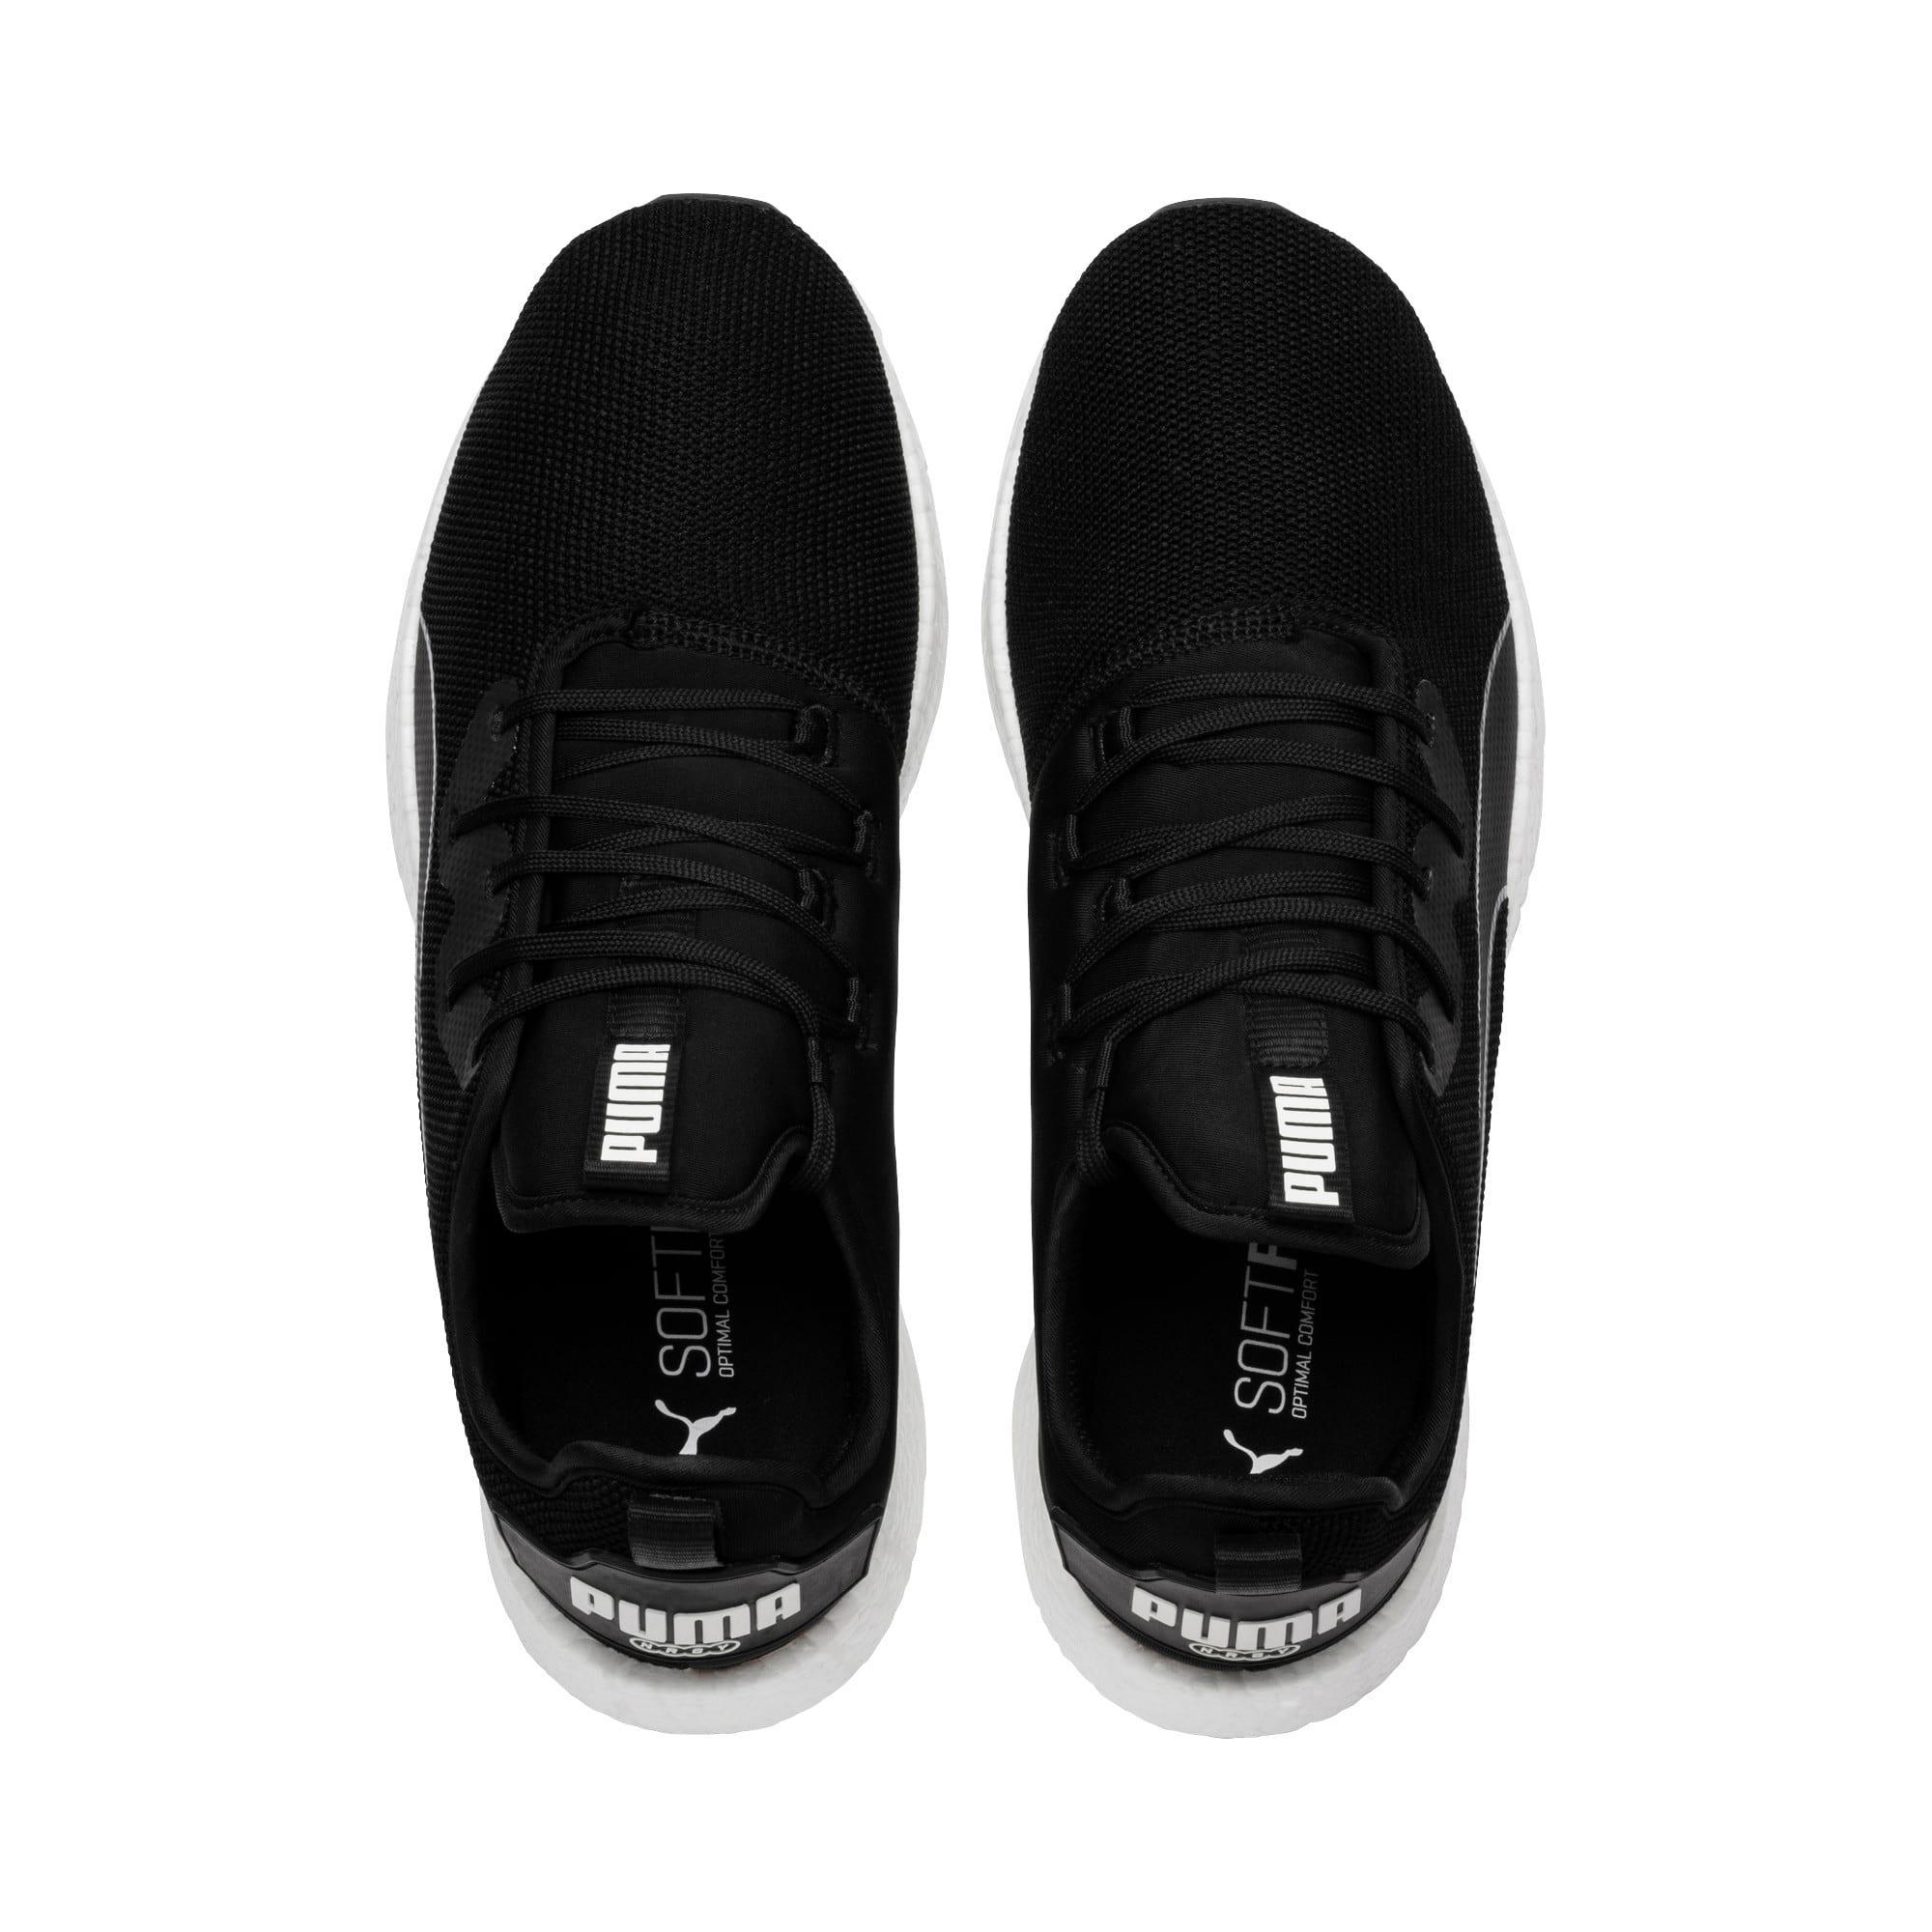 Thumbnail 6 of NRGY Neko Men's Running Shoes, Puma Black-Puma White, medium